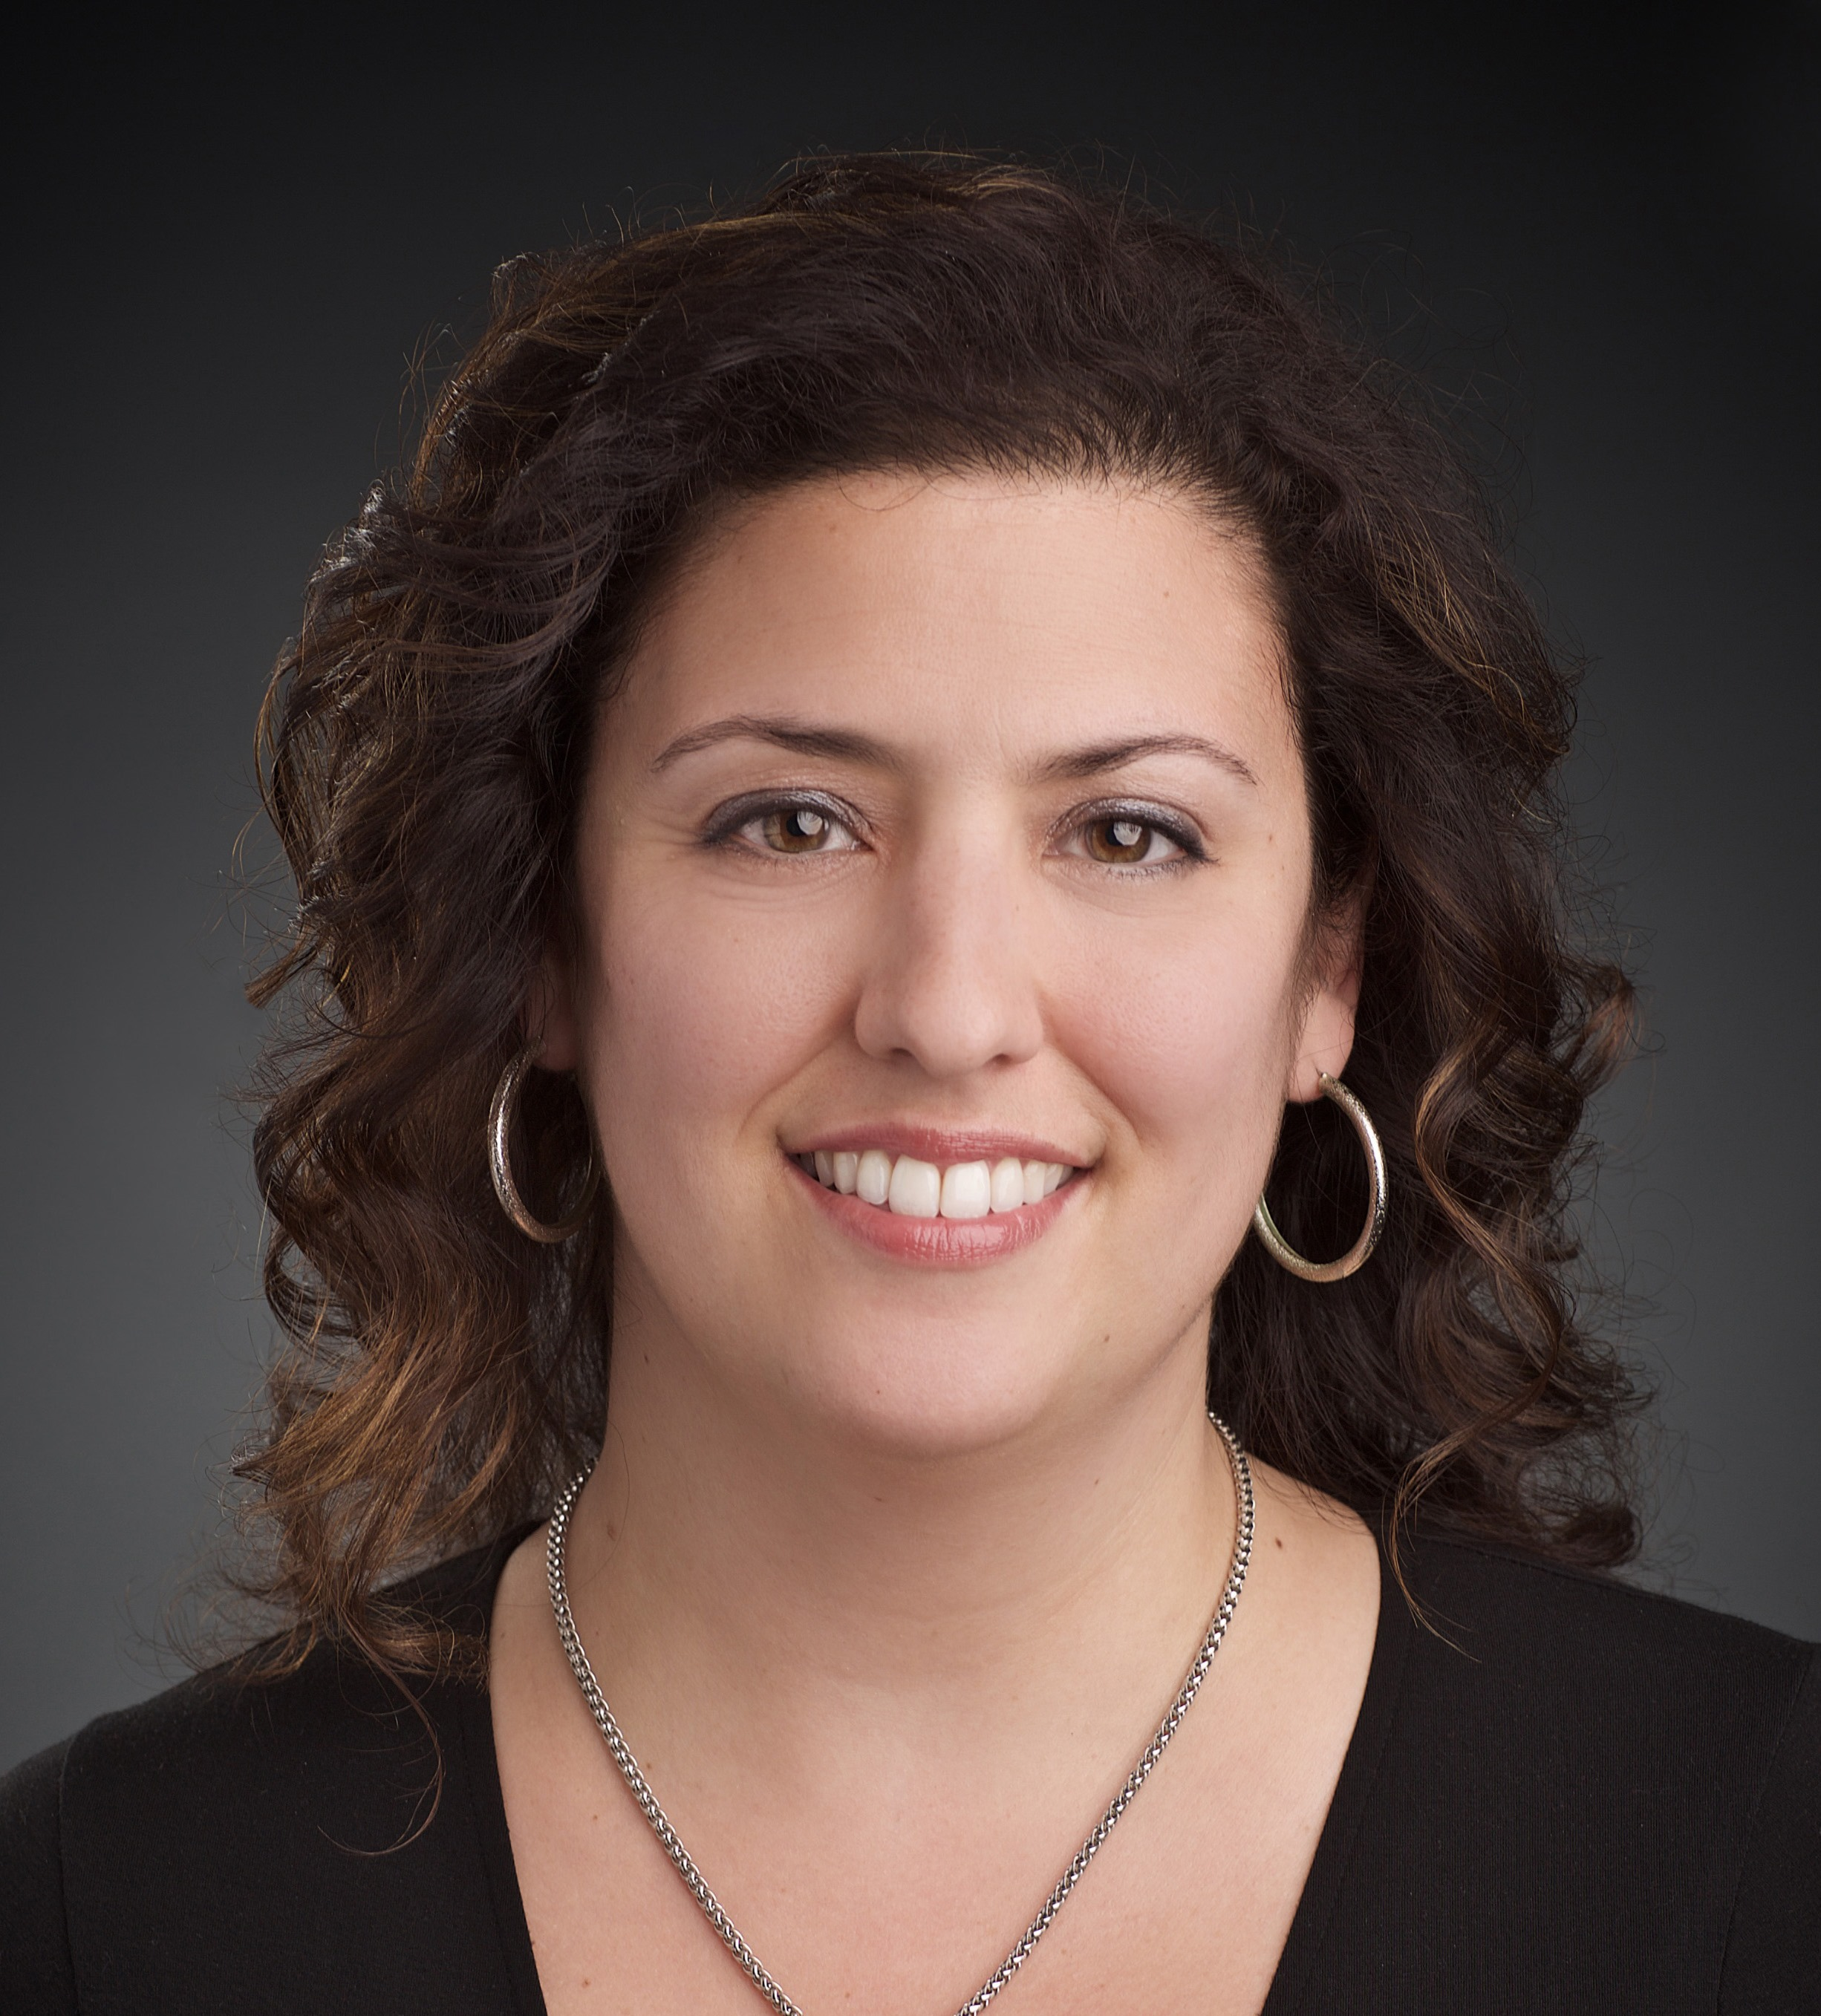 Maria Hatziyiannis